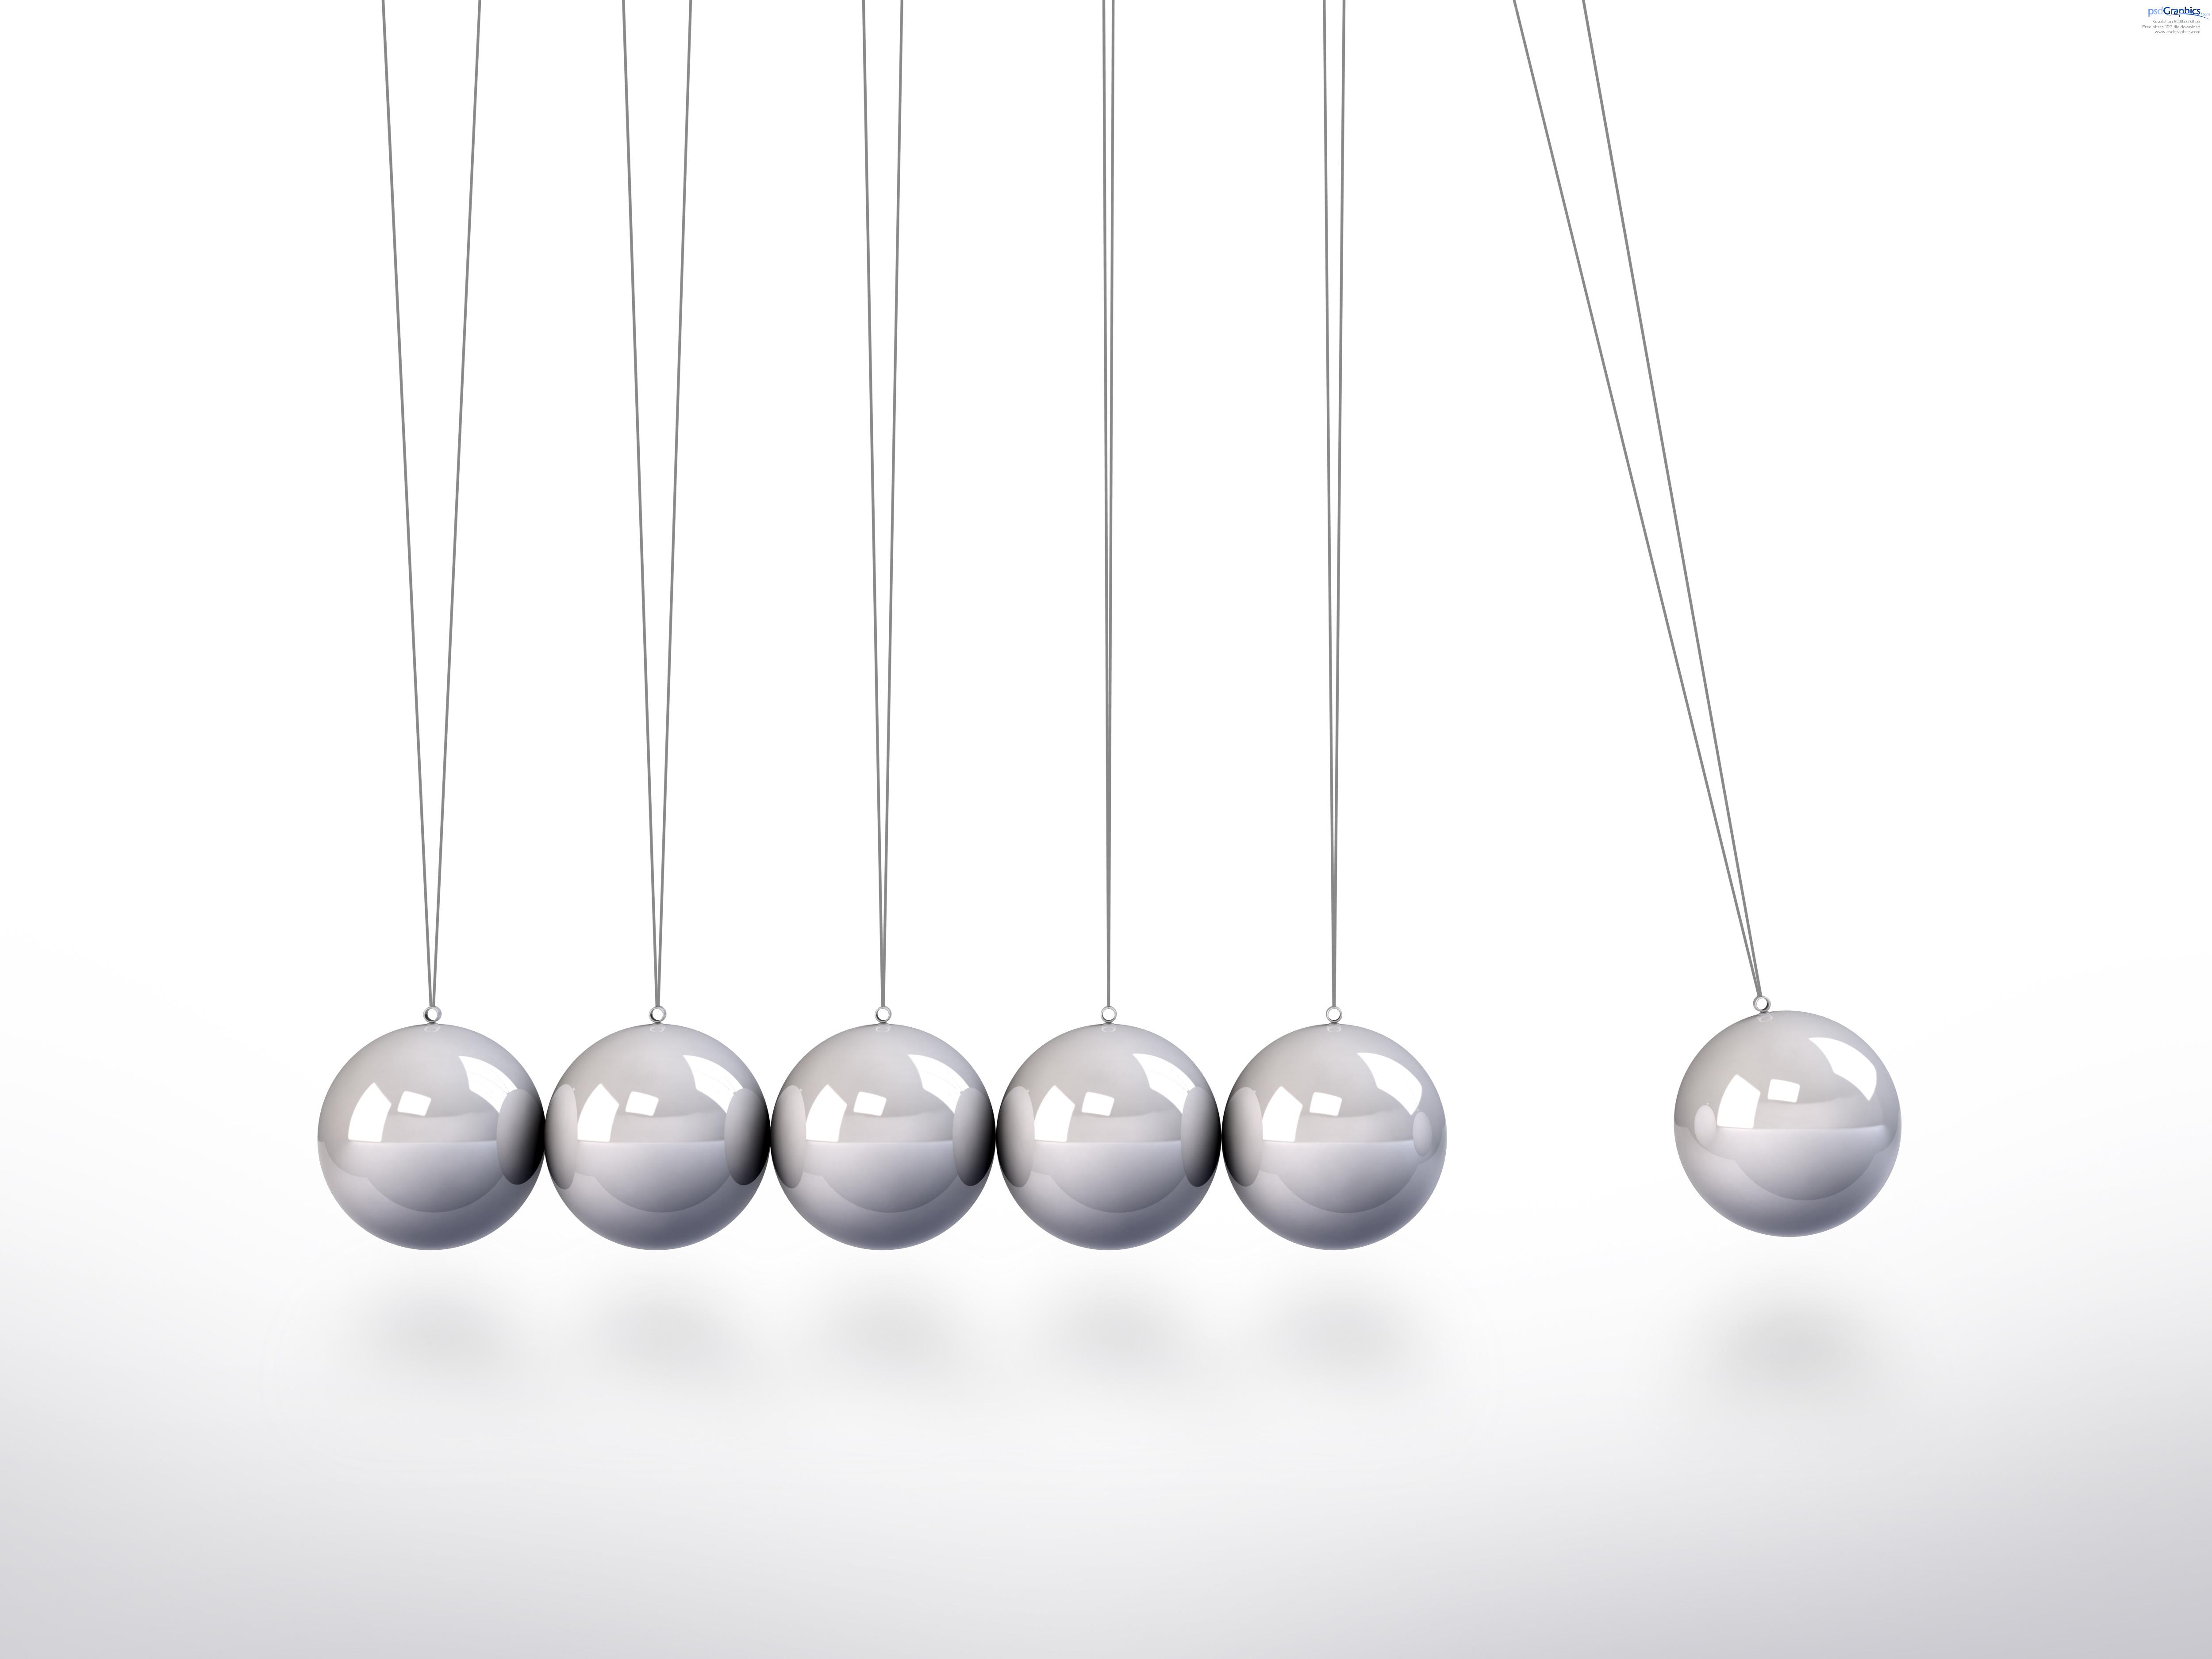 Pendulum Pics, Music Collection